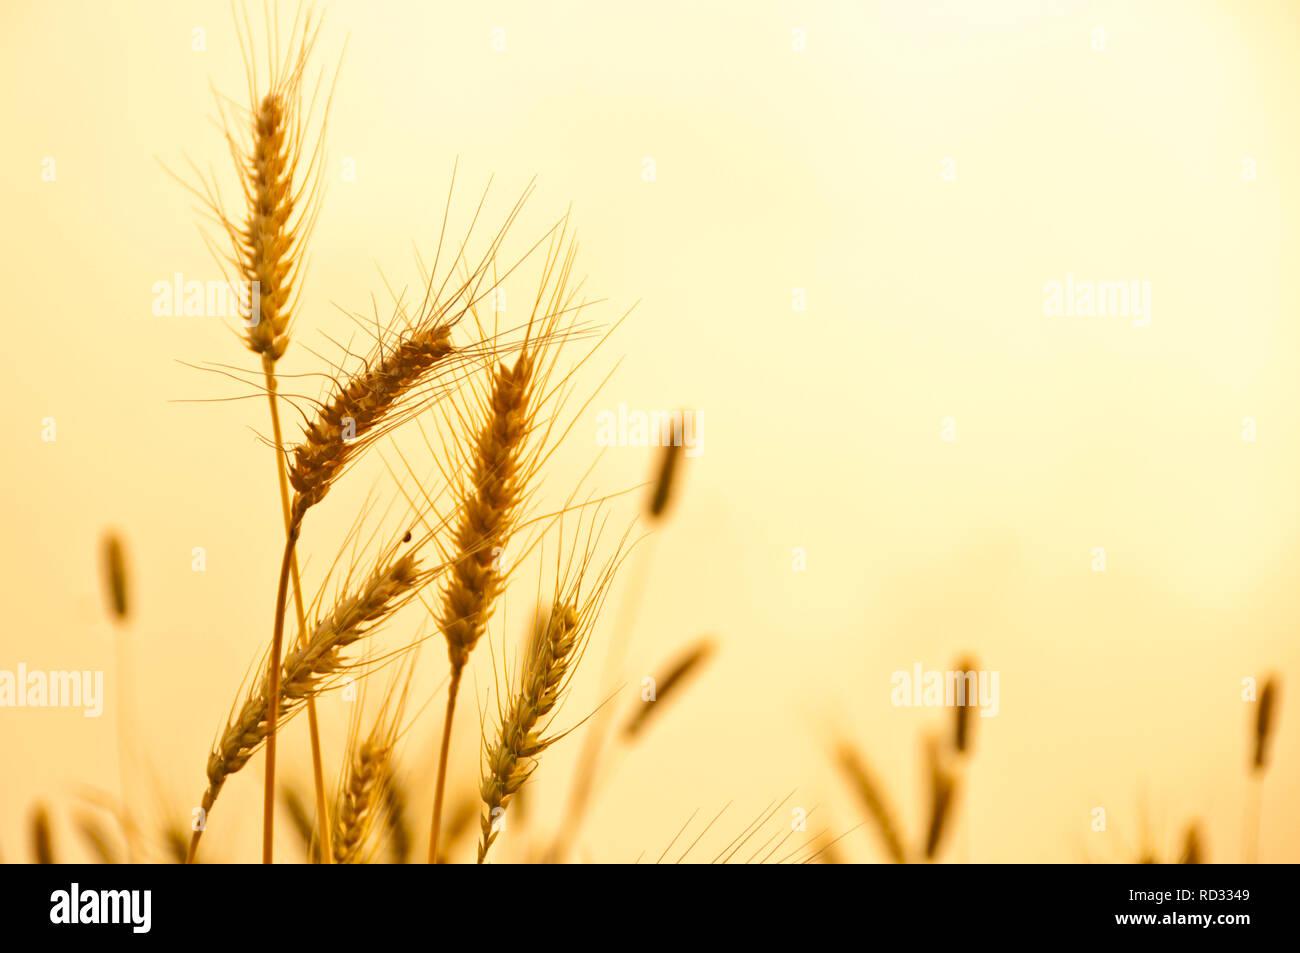 Golden Wheat - Stock Image